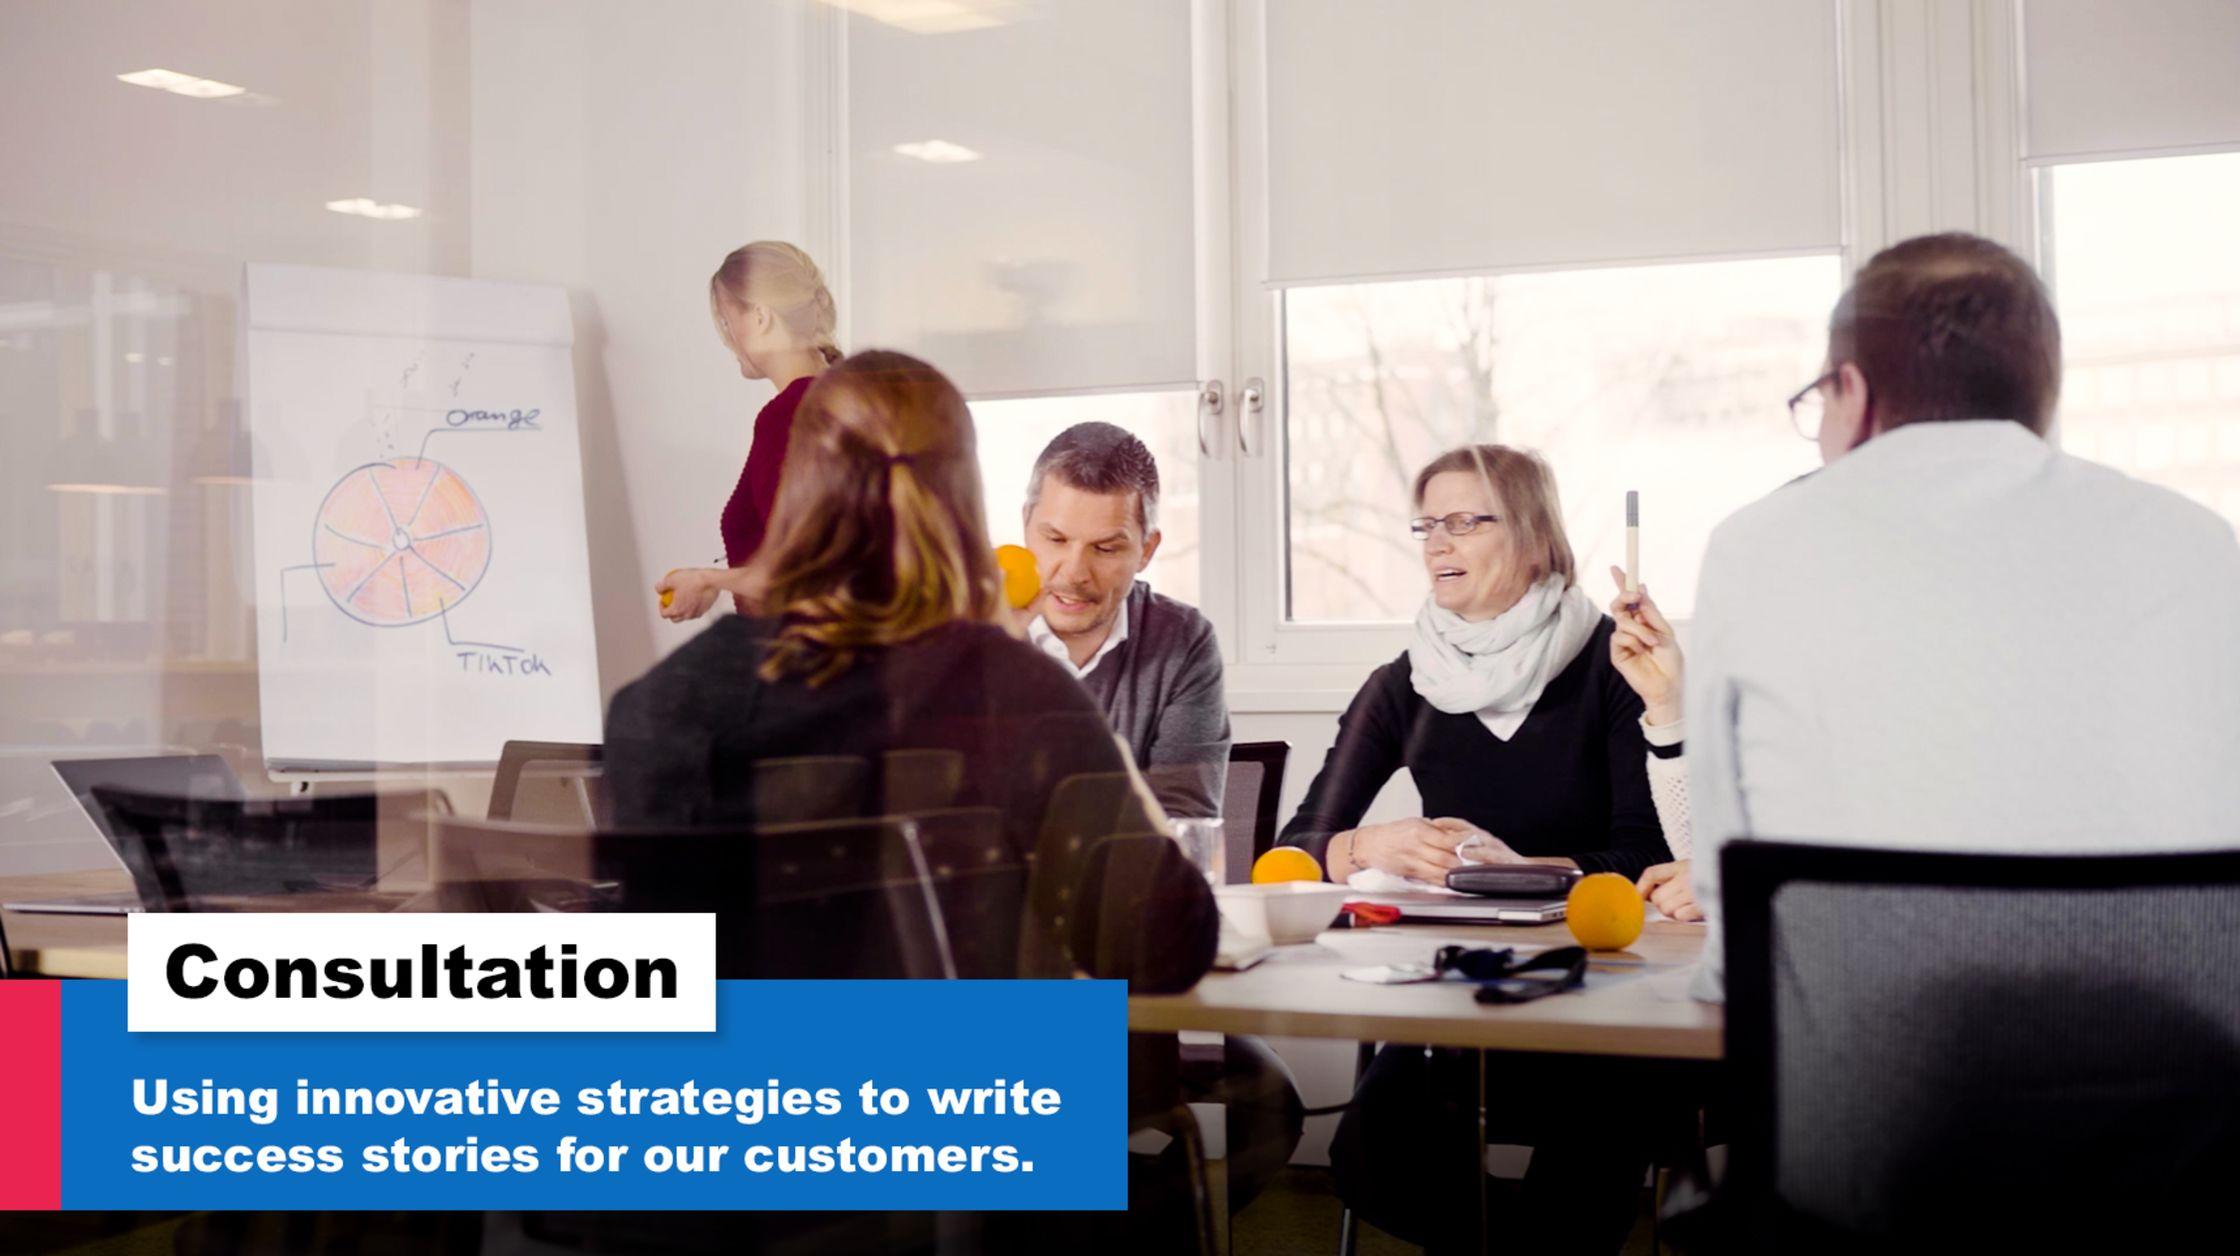 Consultation. Using innovative strategies to write success stories.